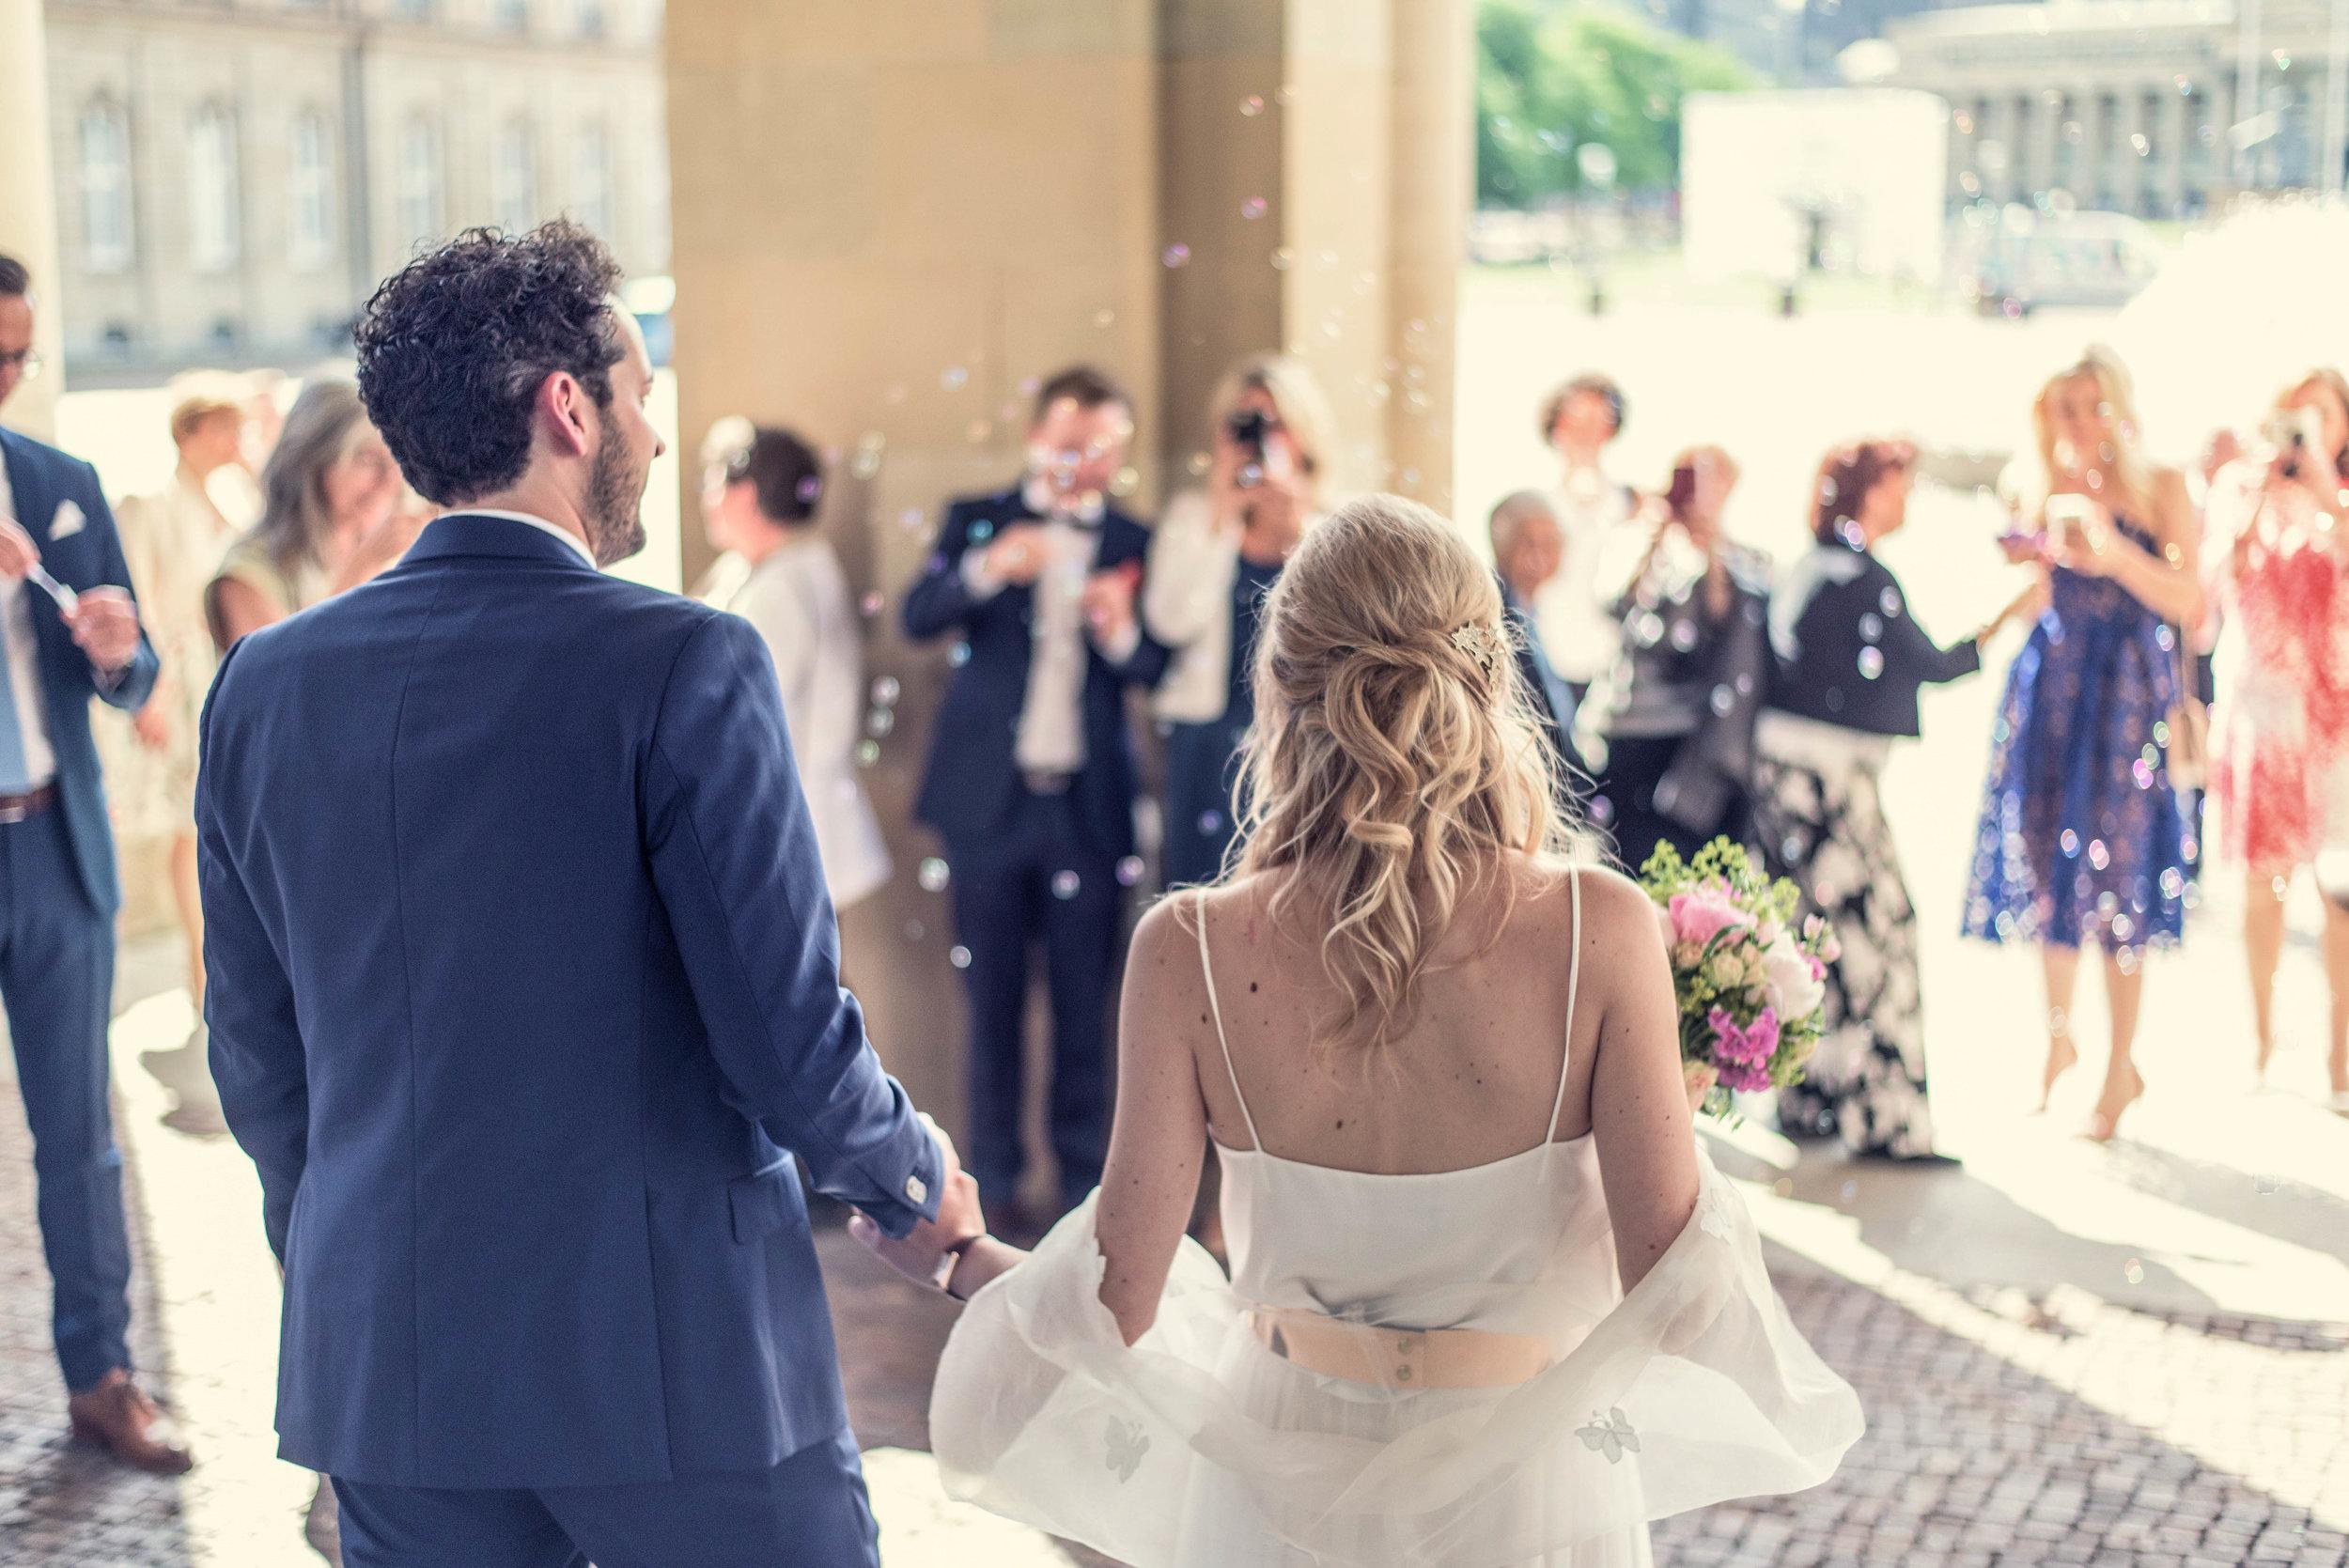 MY CIVIL WEDDING